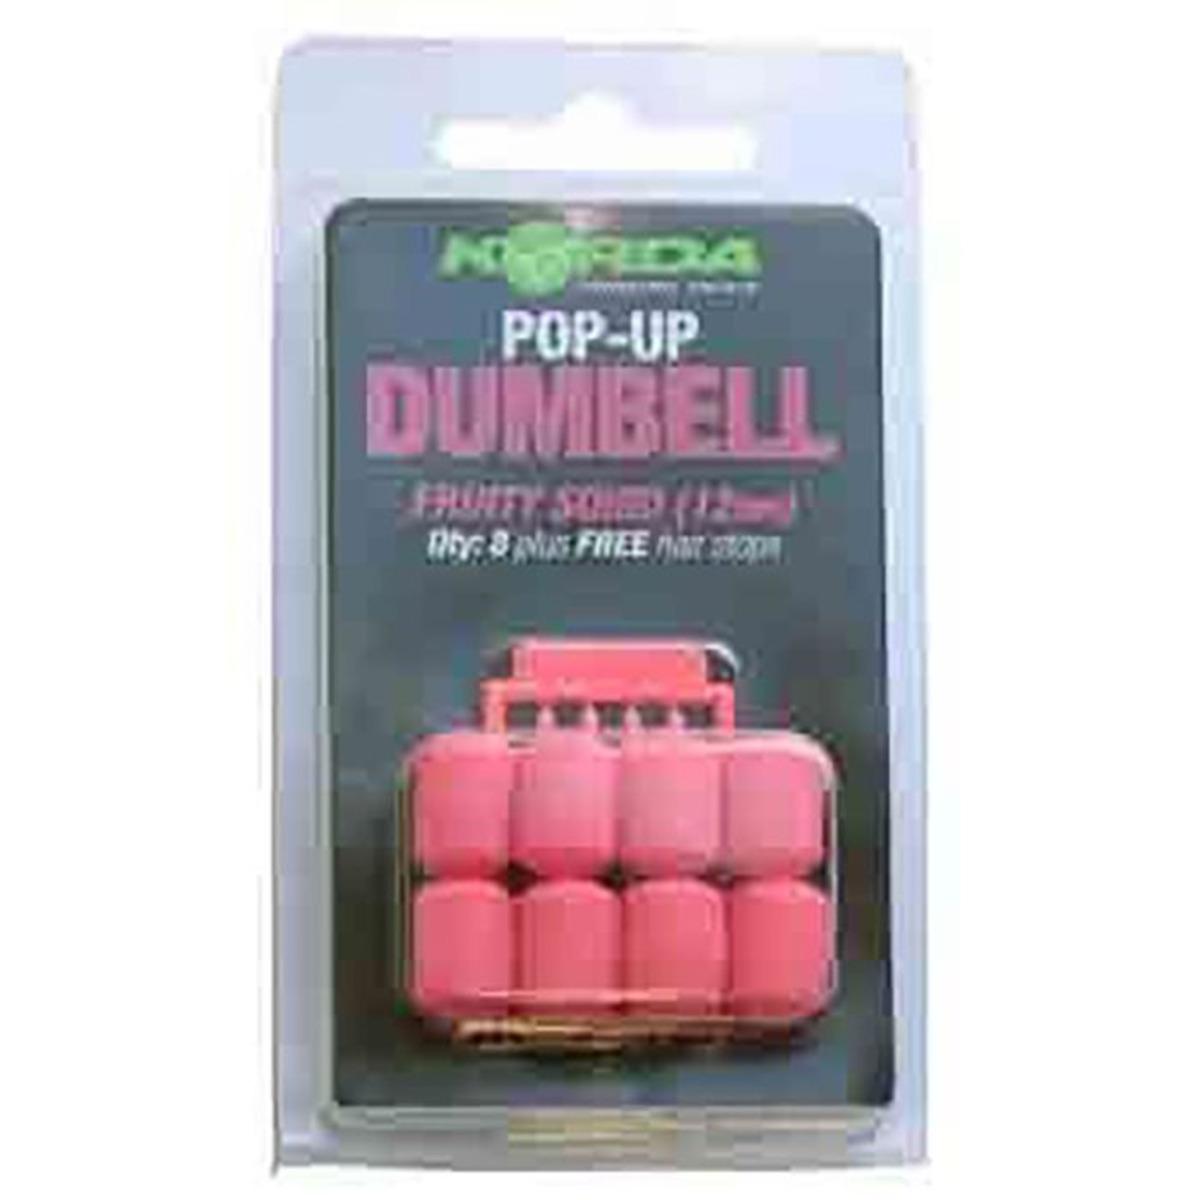 Korda Pop Up Dumbell - Fruity Squid 8 mm